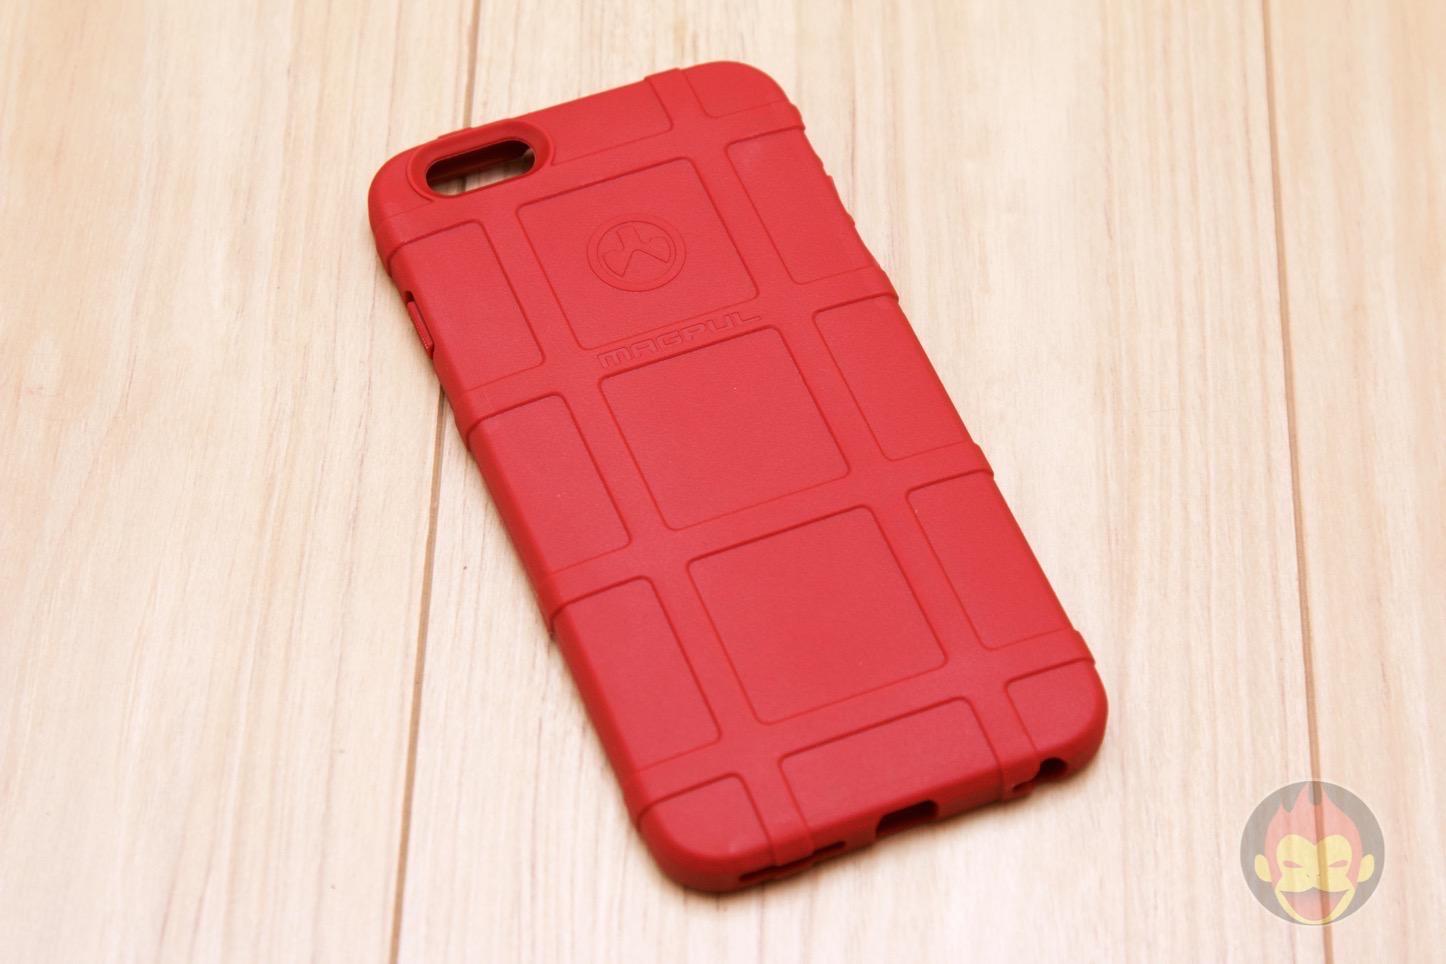 magpul-Field-Case-for-iPhone6splus-04.jpg